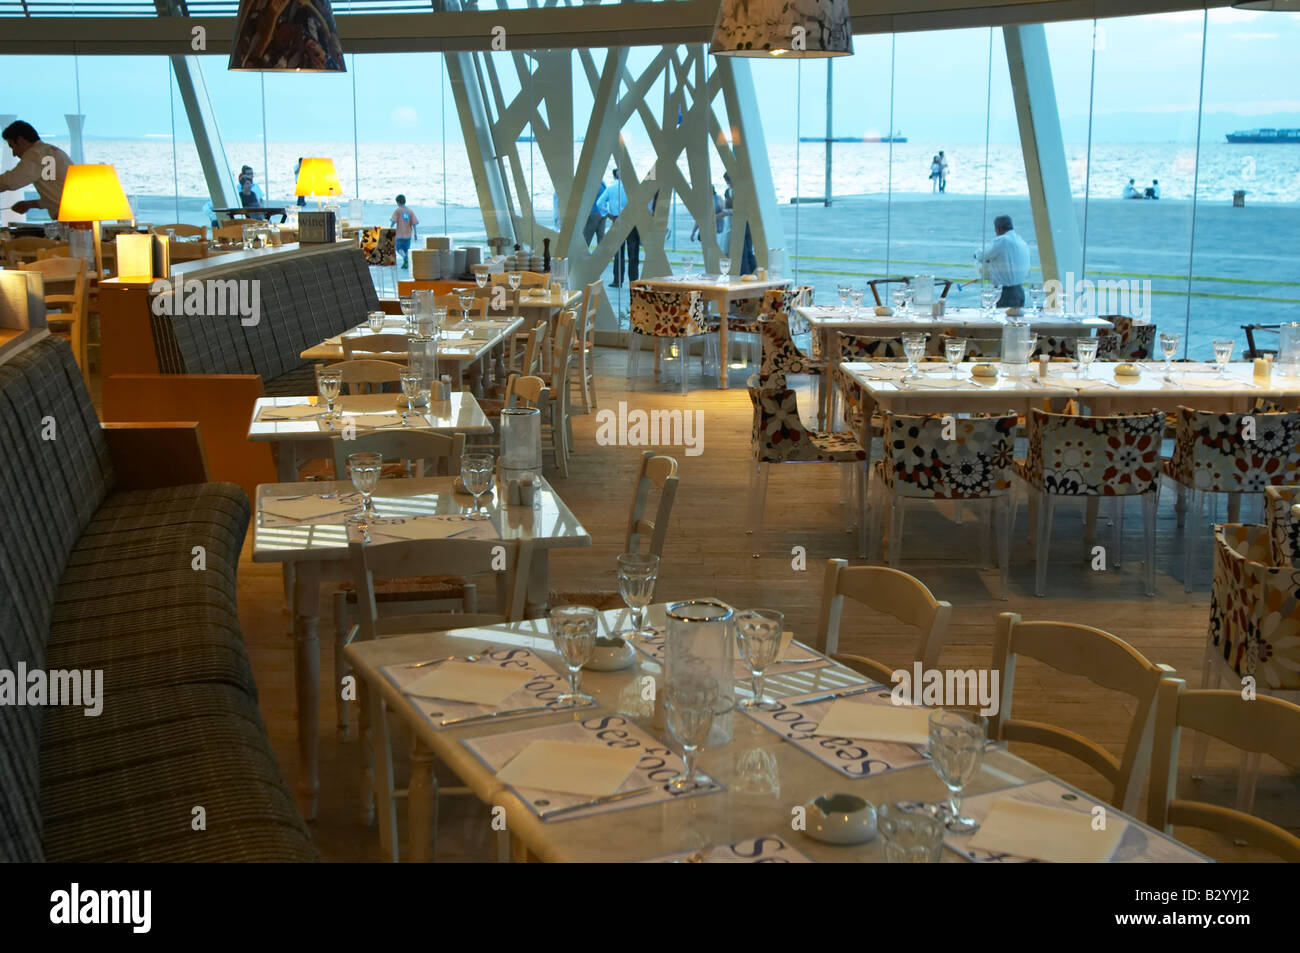 Seafood restaurant at Macedonia Palace Hotel. Thessaloniki, Macedonia, Greece - Stock Image